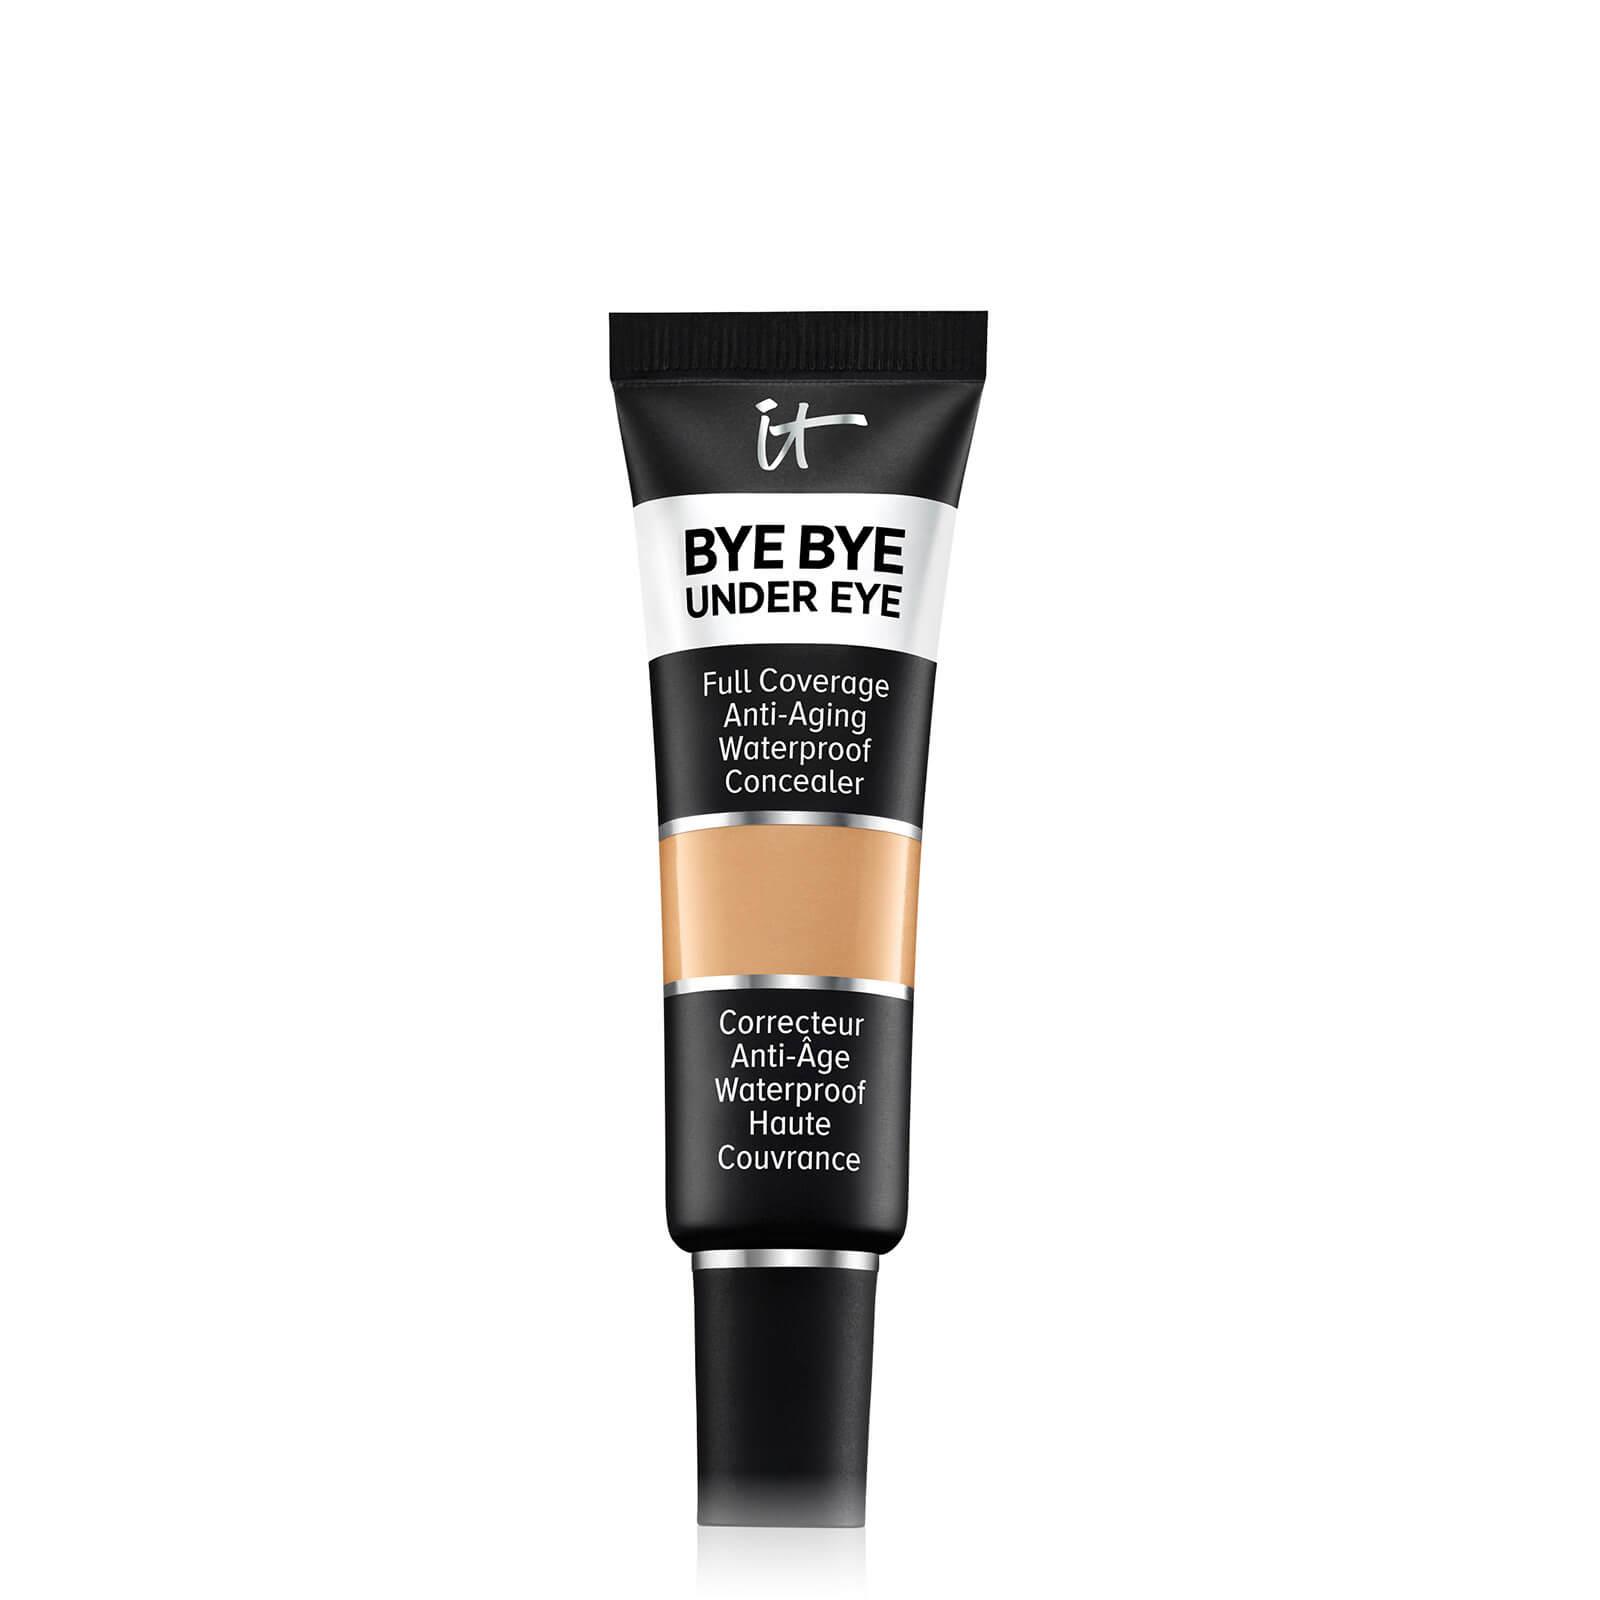 Купить IT Cosmetics Bye Bye Under Eye Concealer 12ml (Various Shades) - Medium Tan